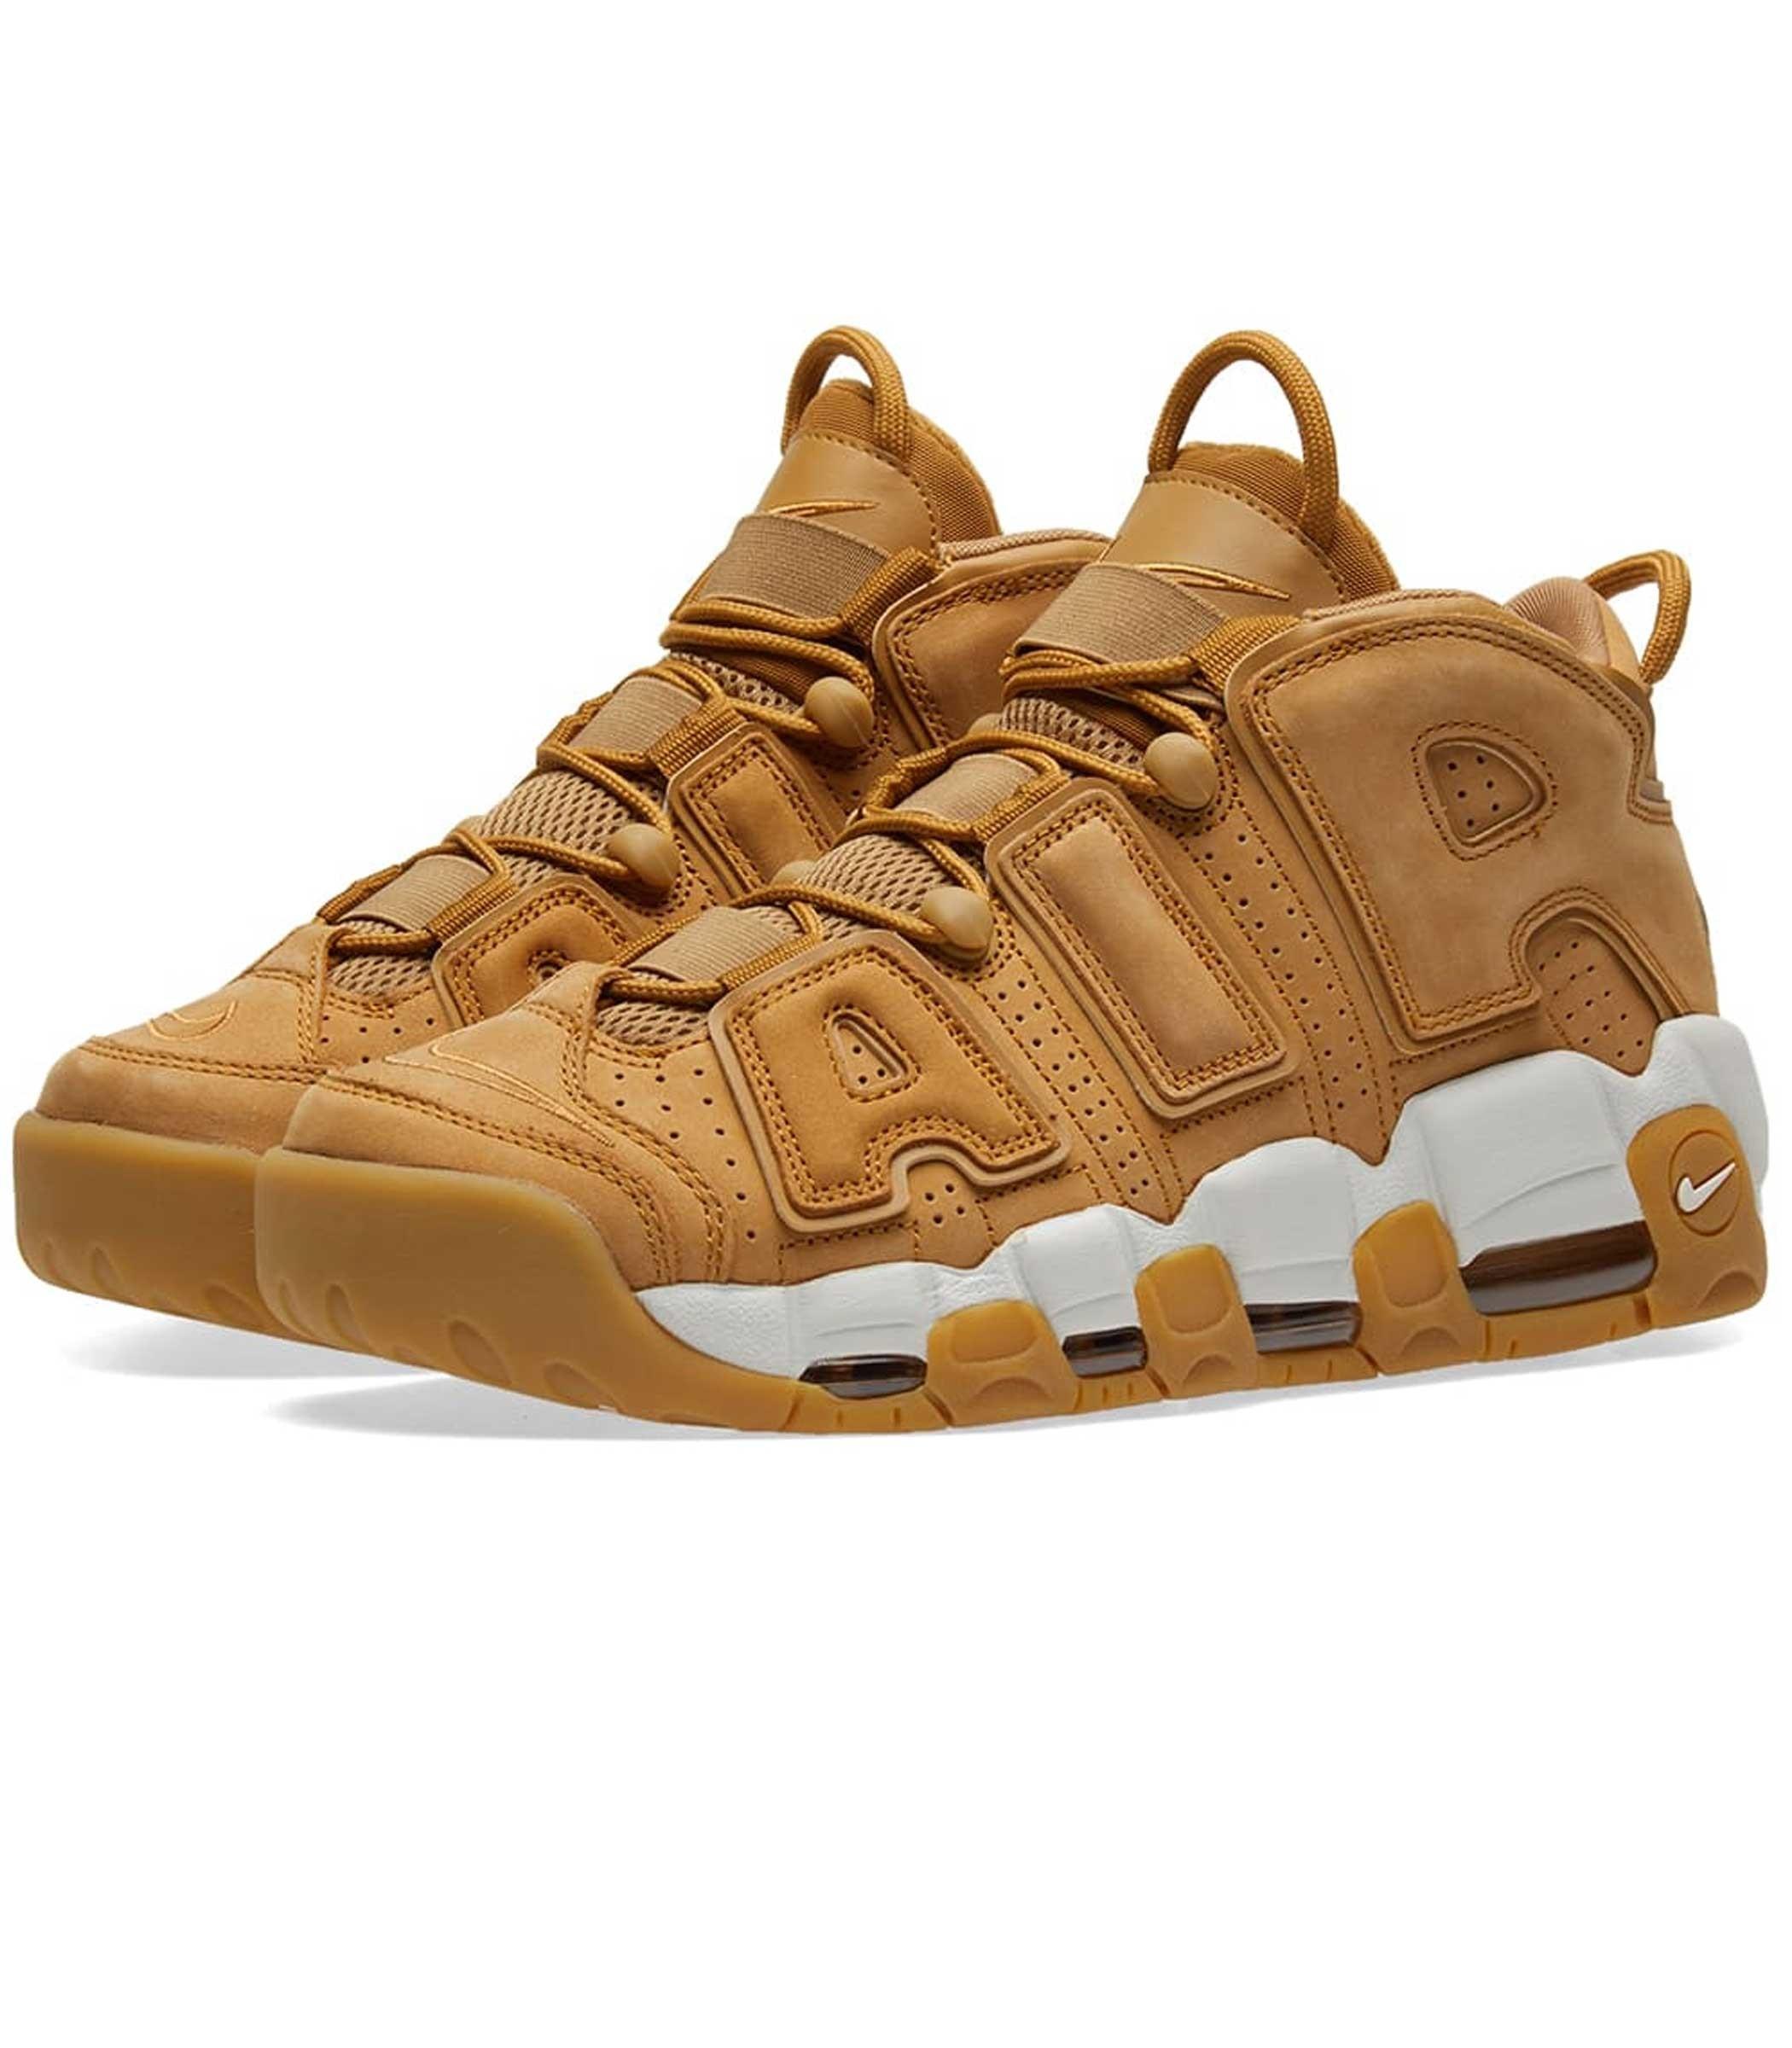 NIKE Air more uptempo'96 Uomo Scarpe Sneaker Scarpe da Ginnastica da Uomo aa4060200